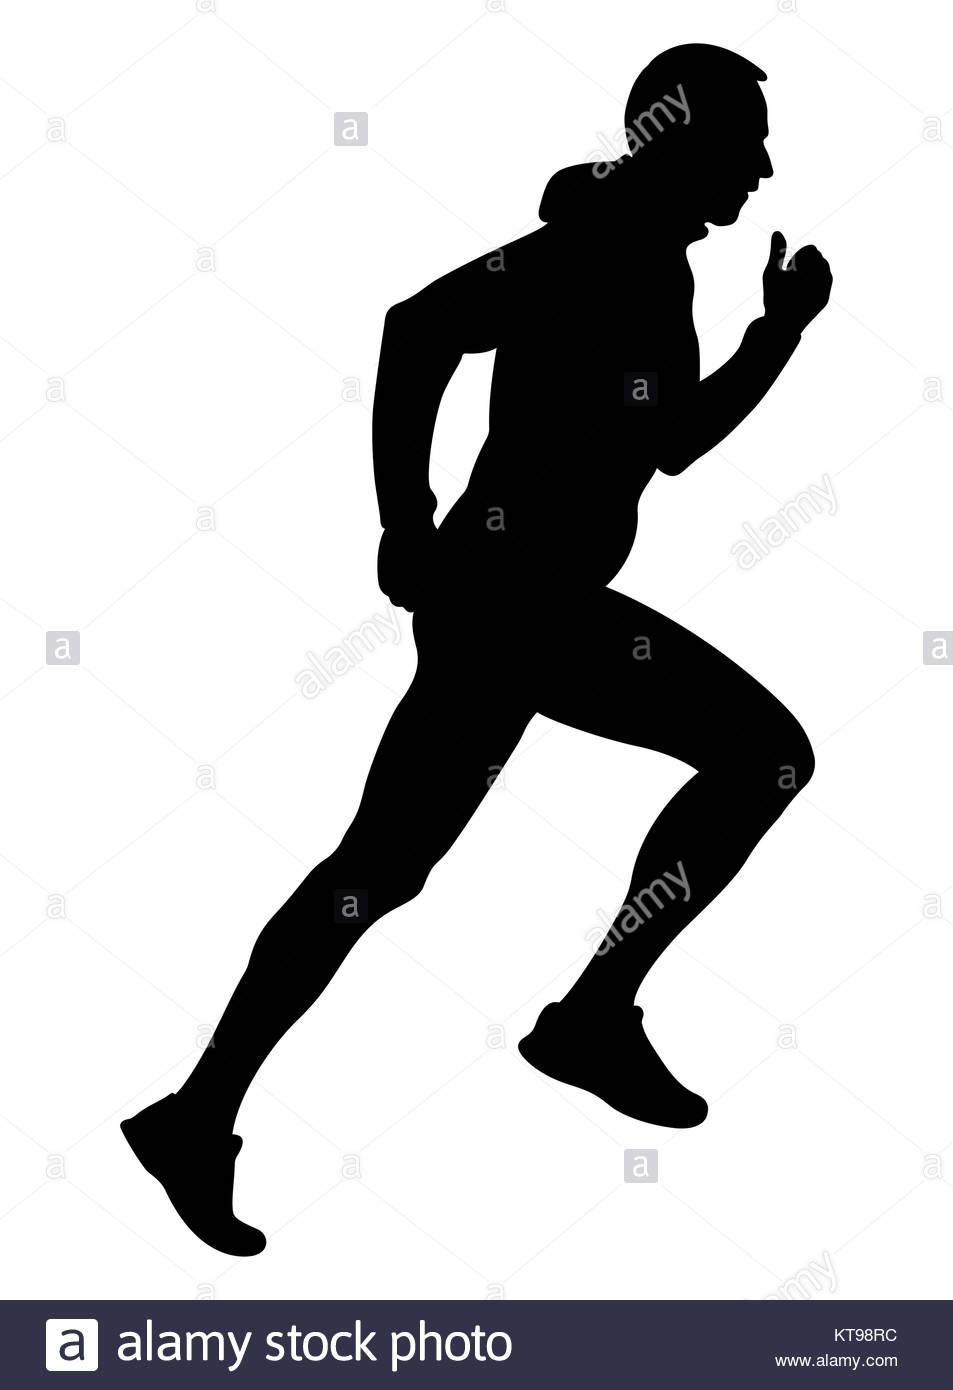 953x1390 Black Silhouette Male Runner Running Uphill In Hooded Jacket Stock